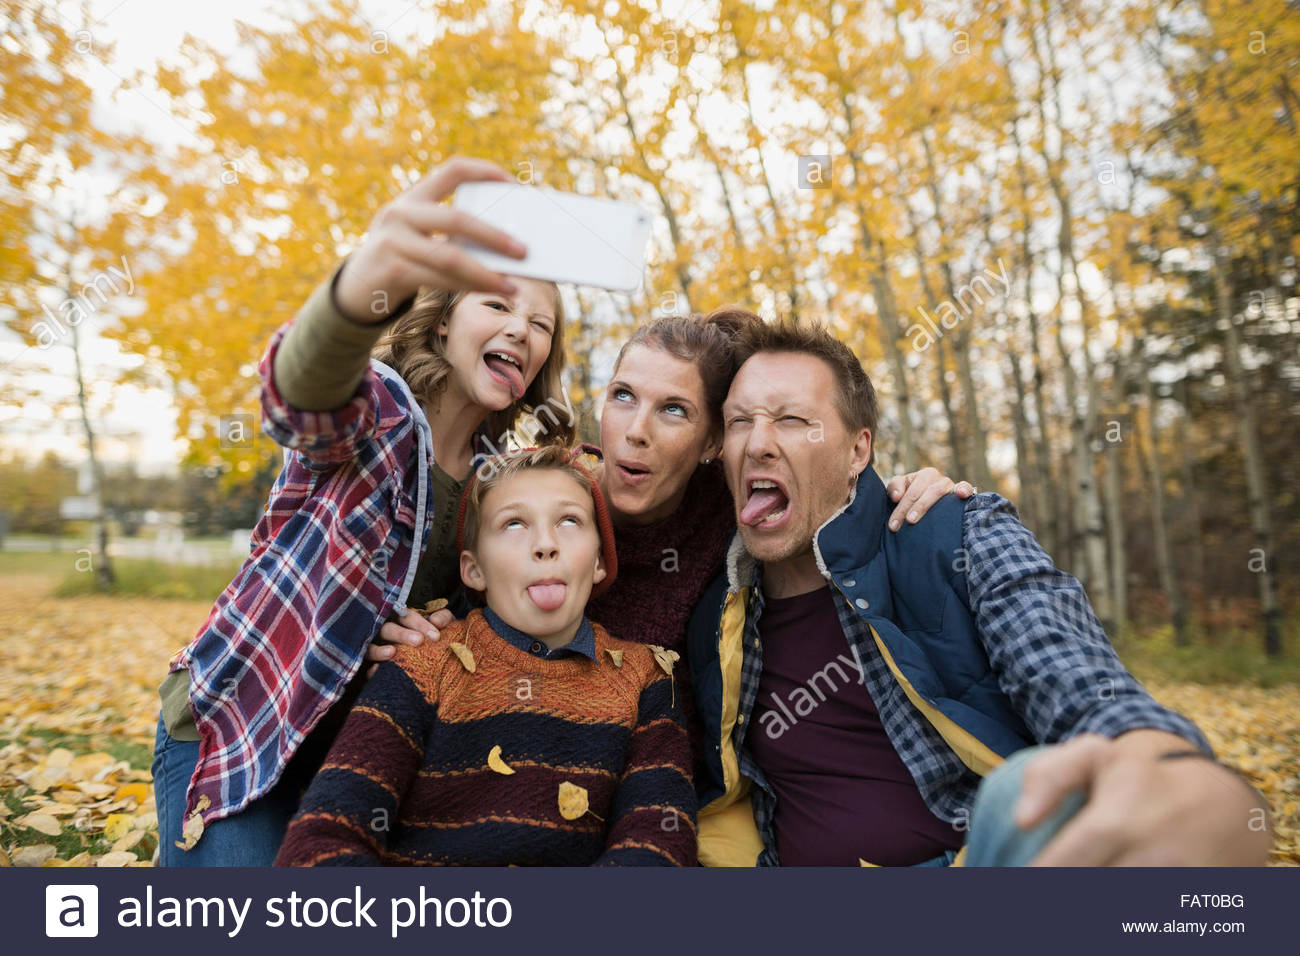 Familia tonta teniendo selfie haciendo caras otoño park Imagen De Stock